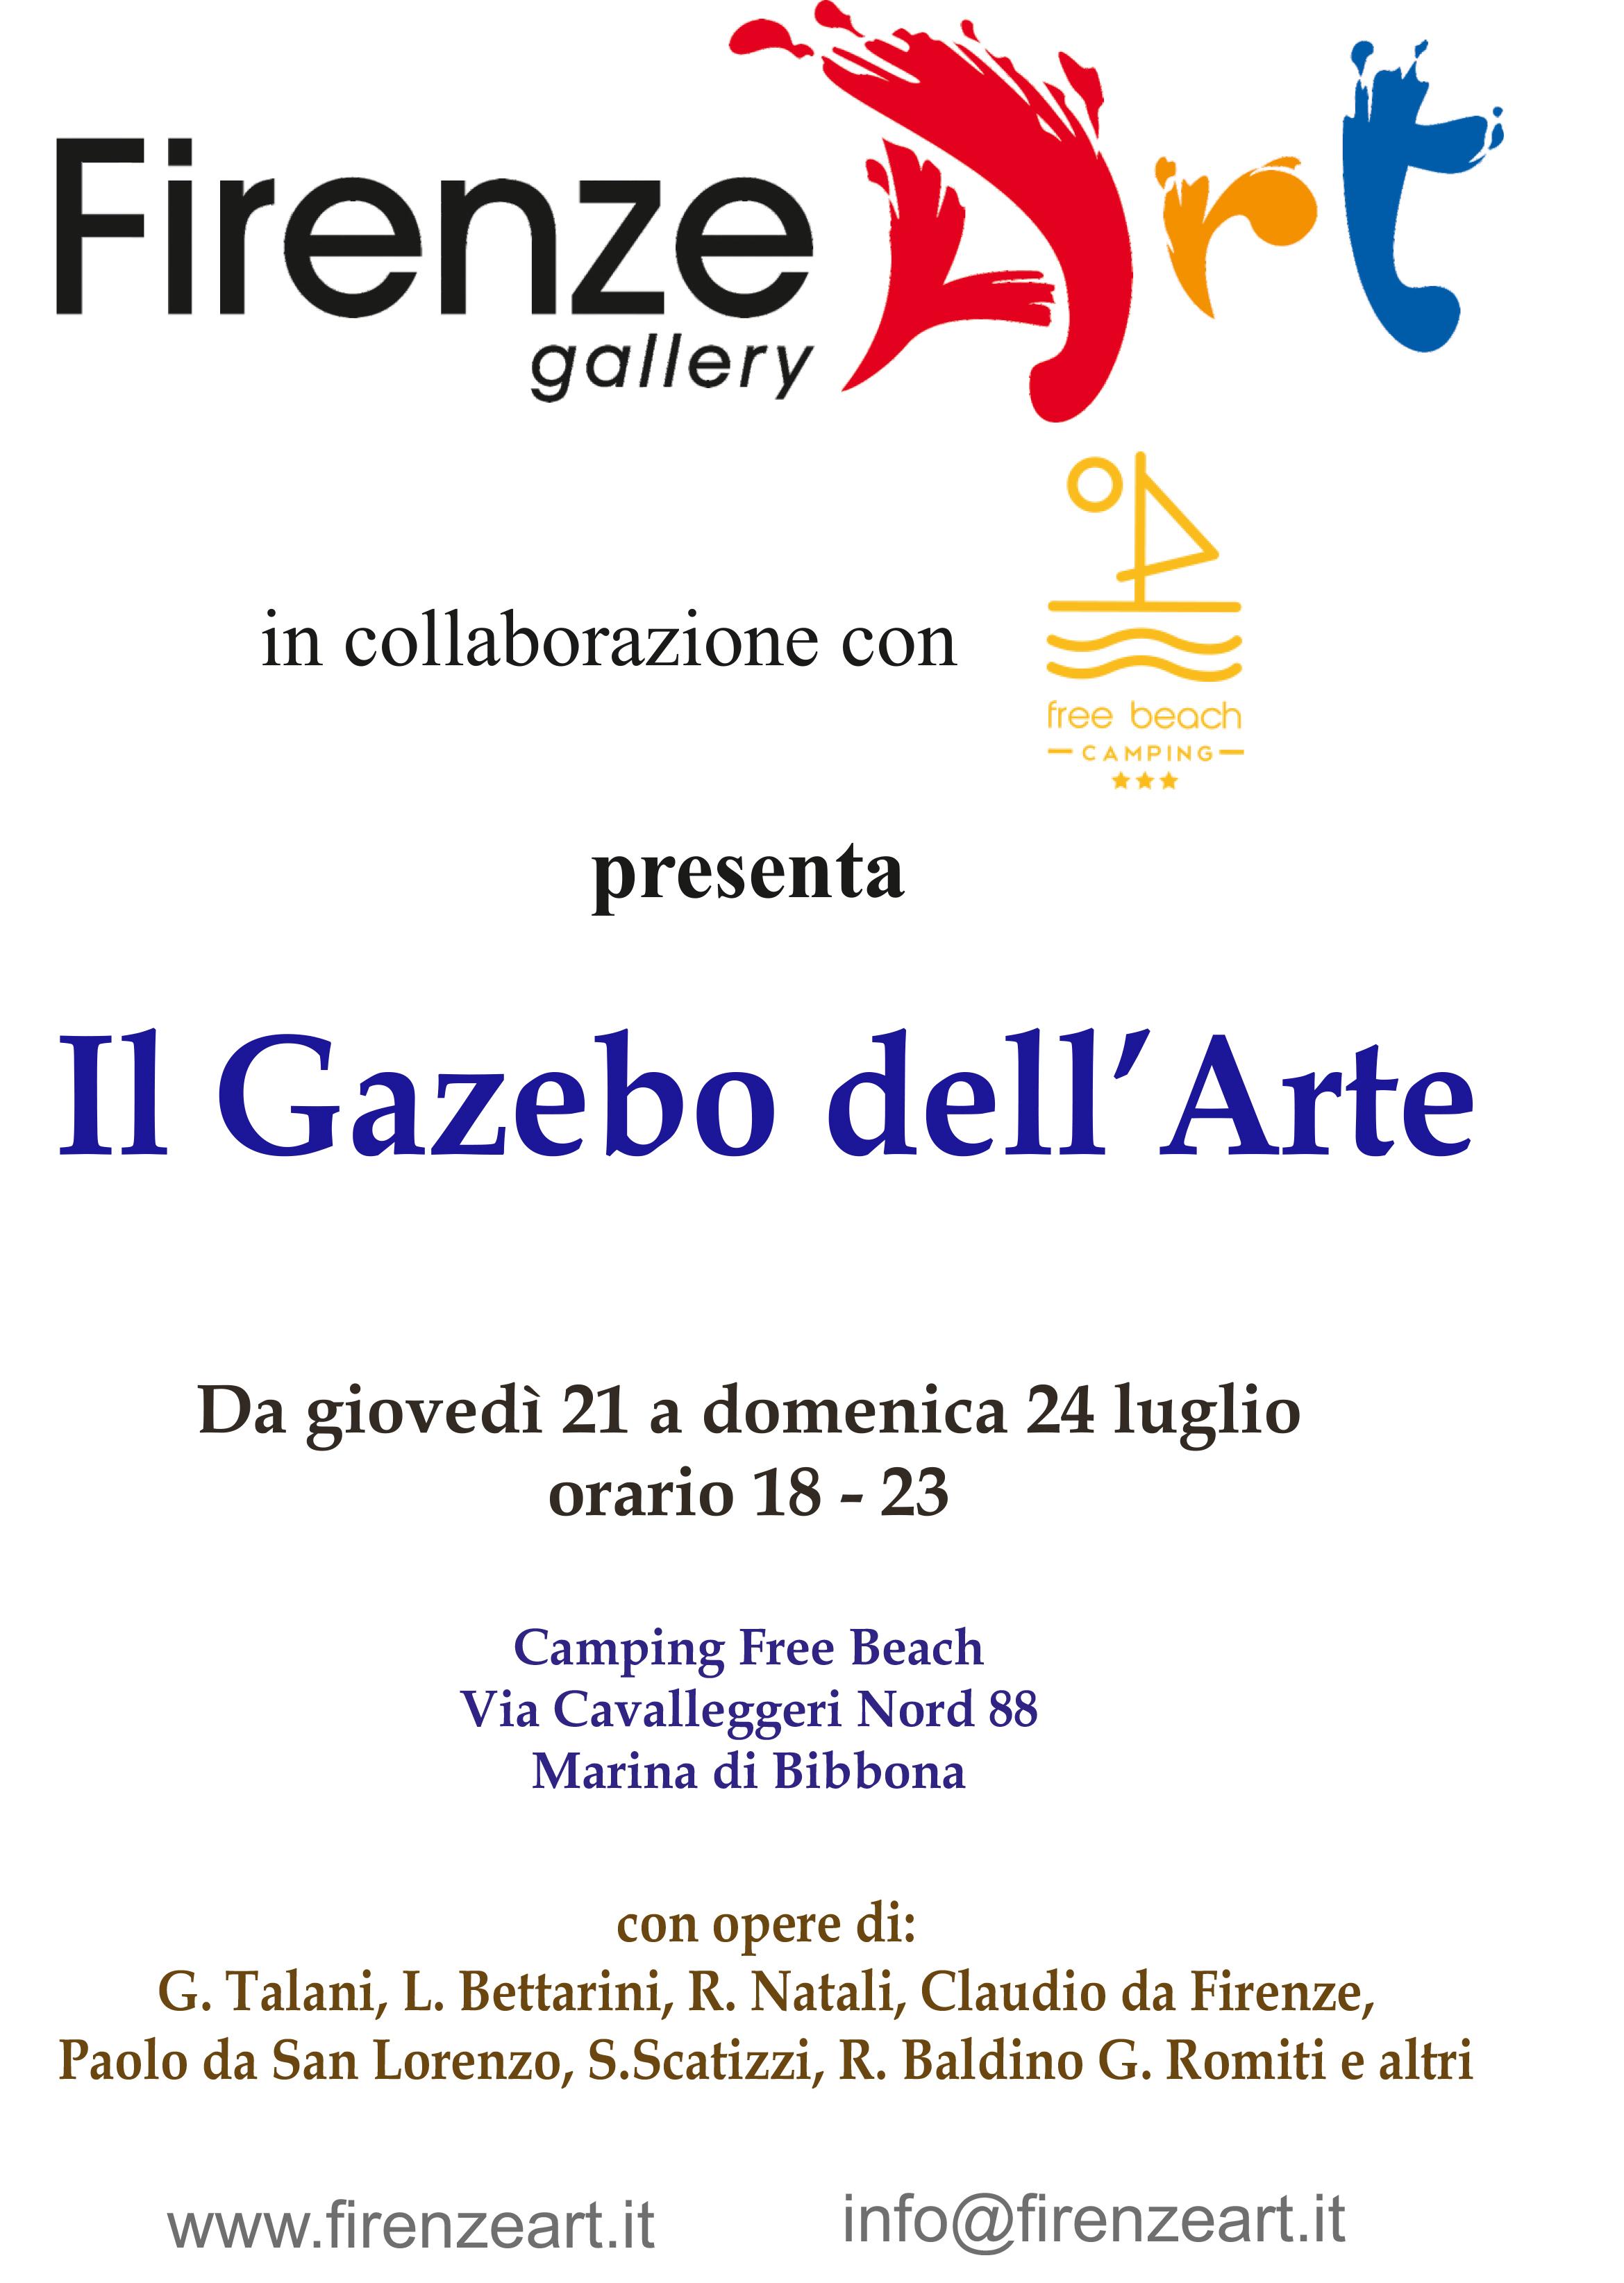 gazebo dell'arte.cdr